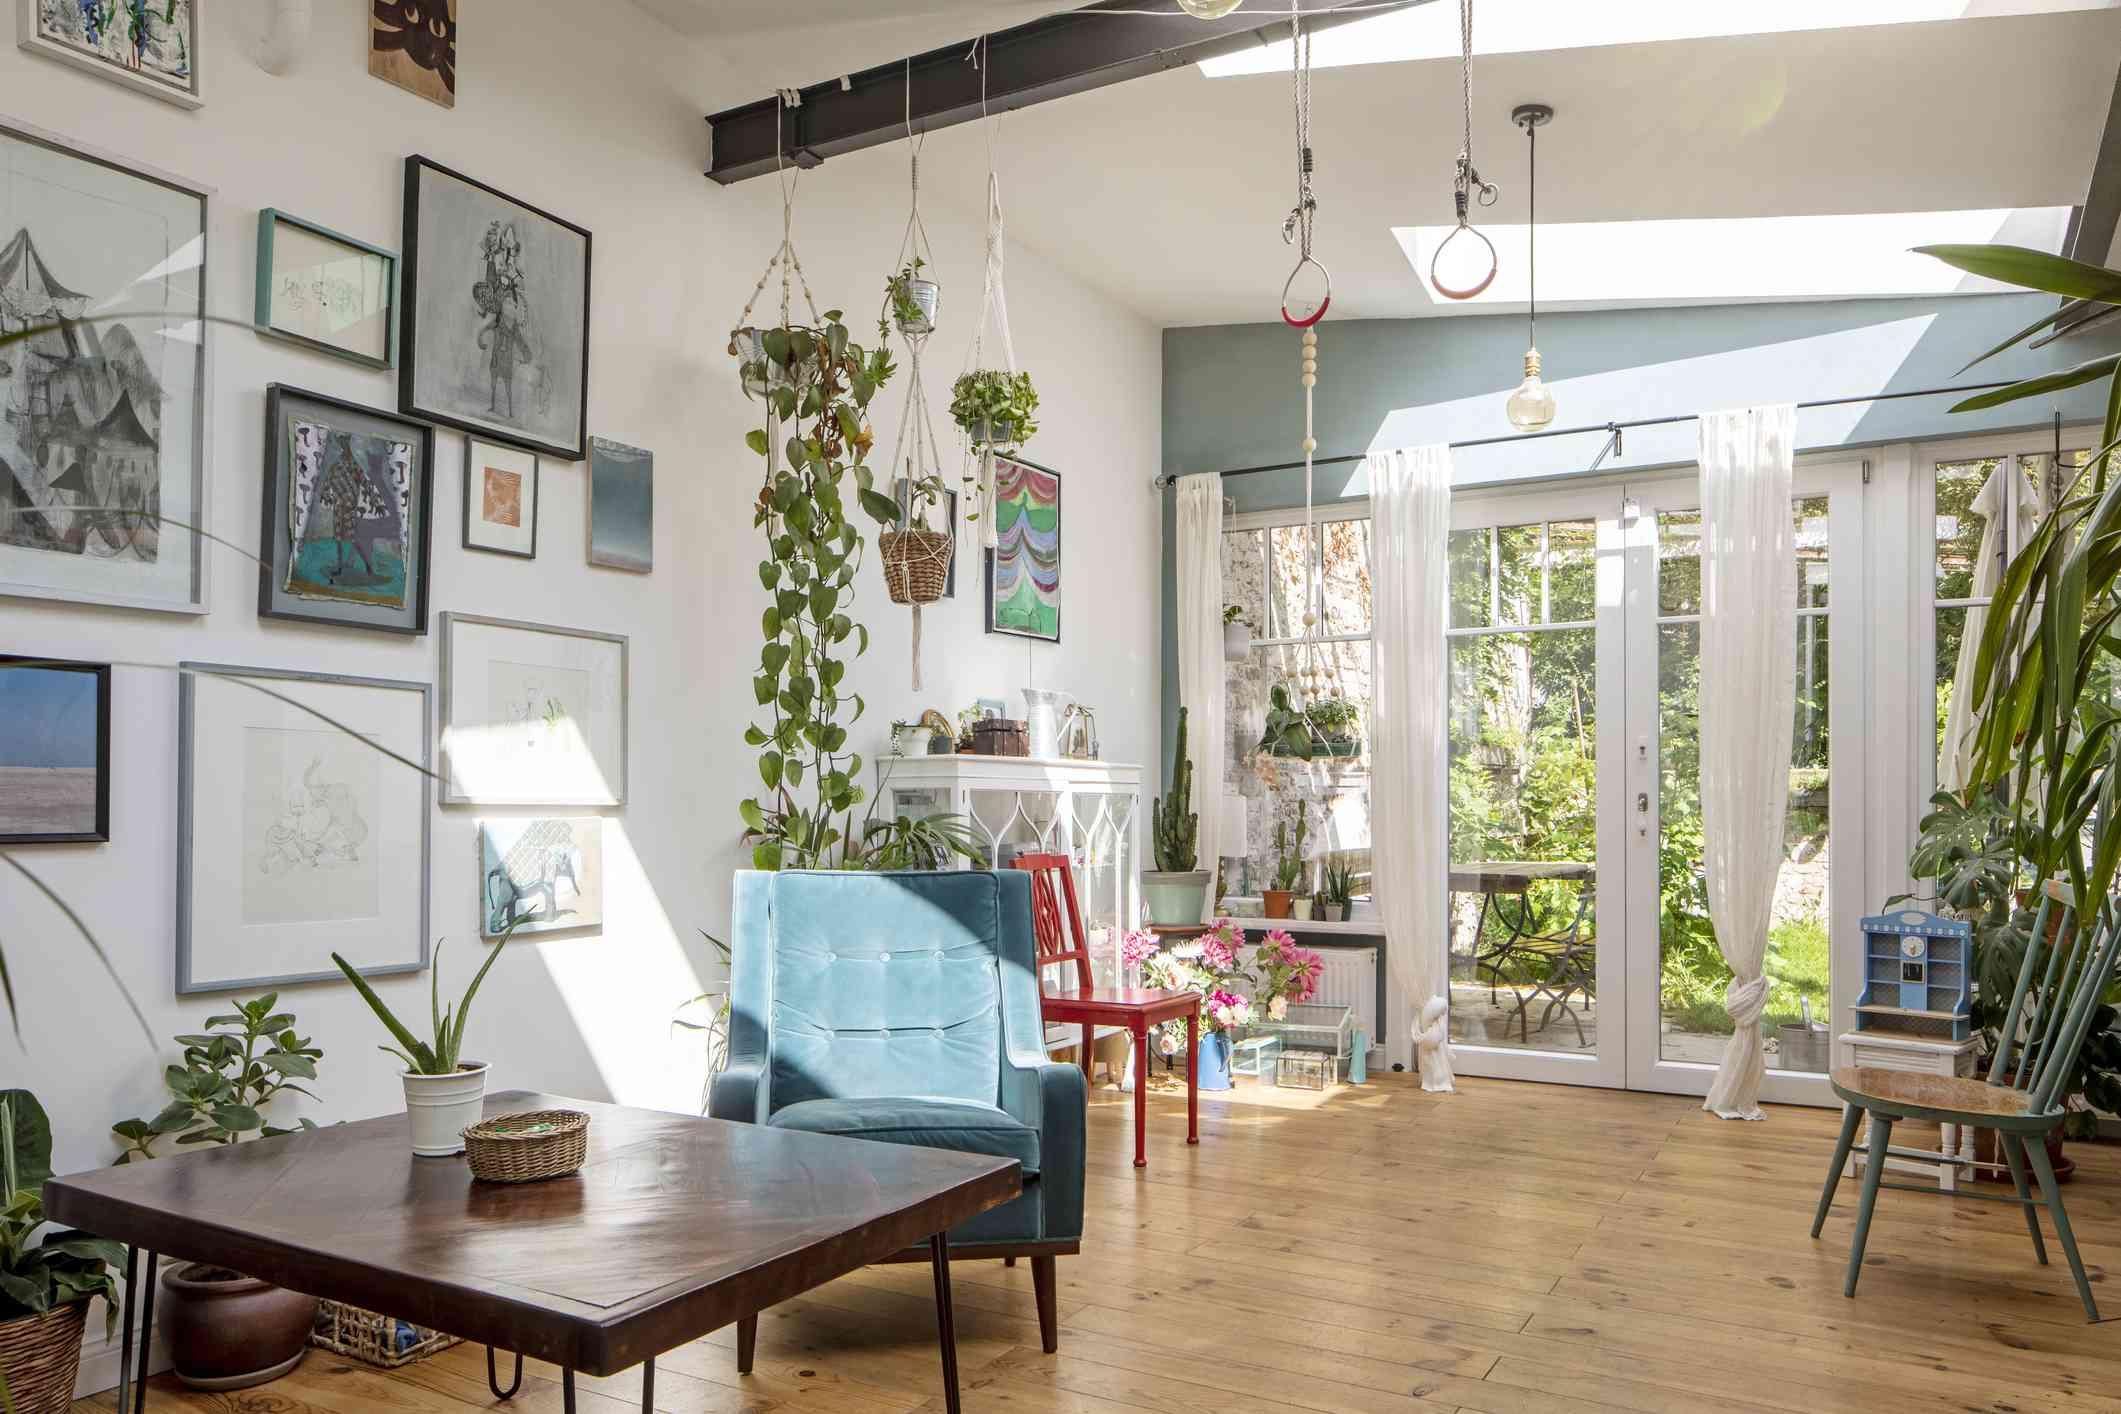 interior with plants